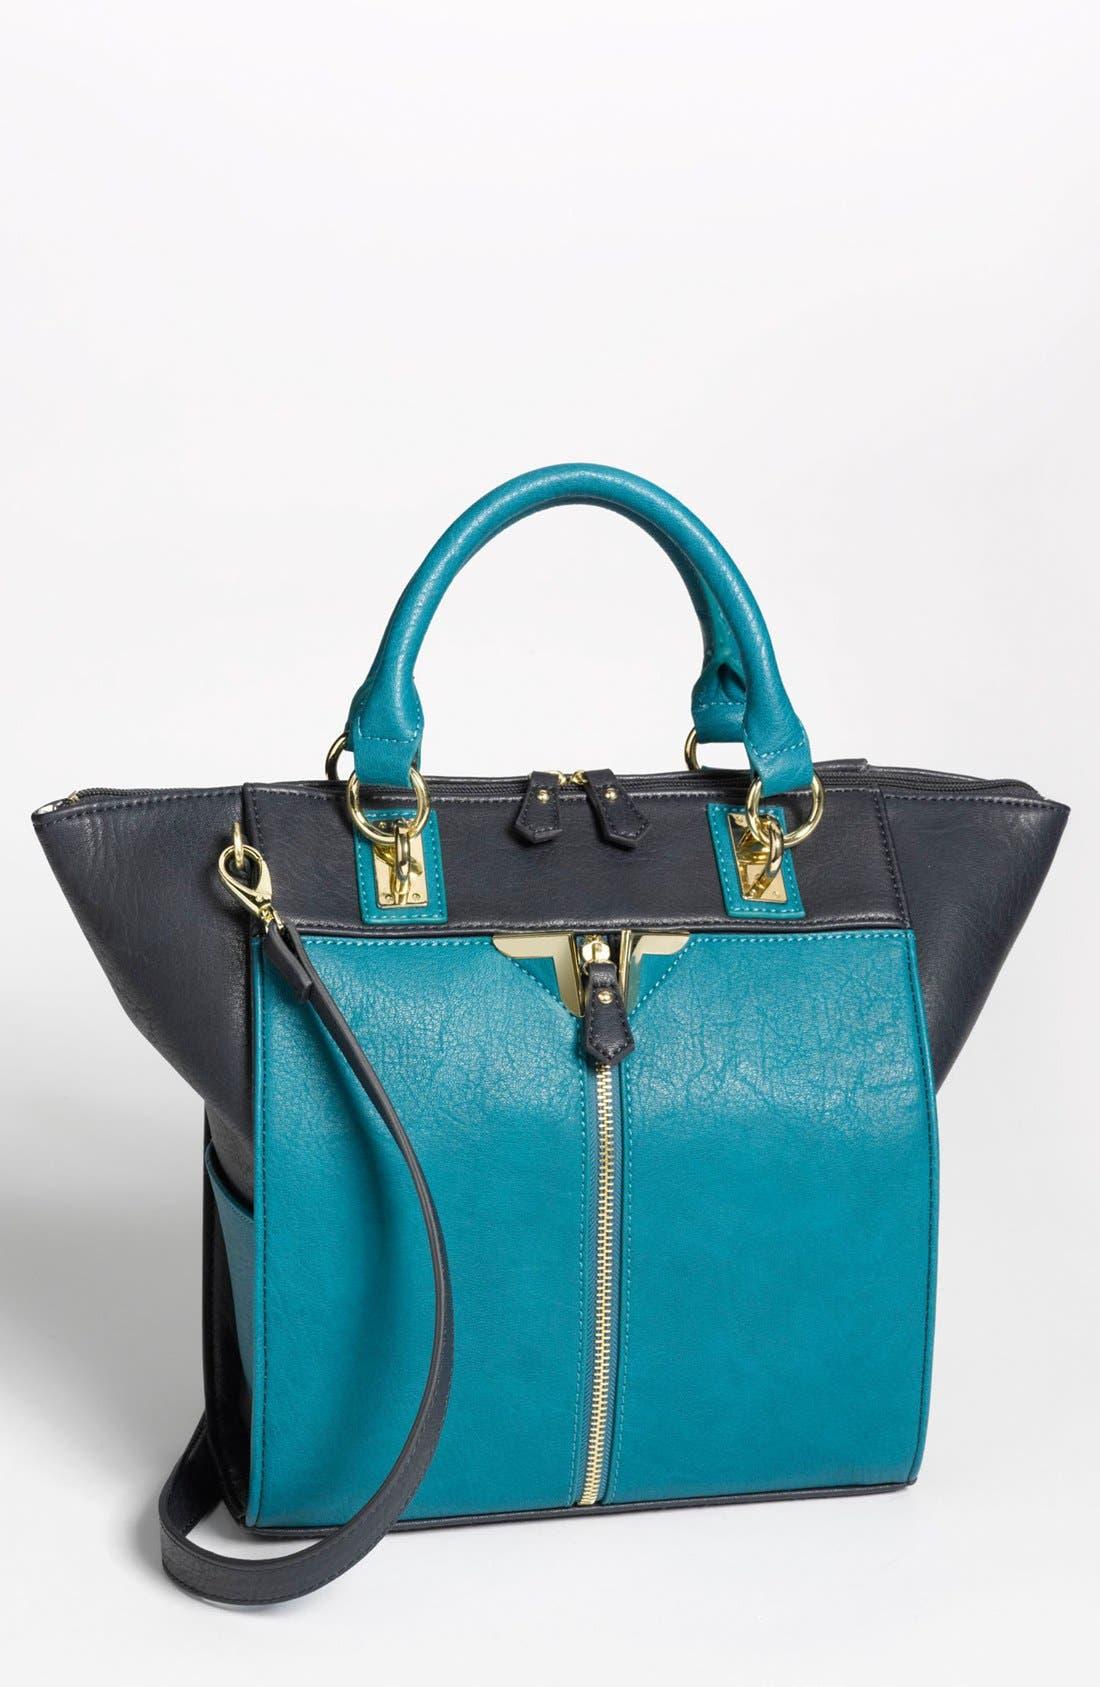 Alternate Image 1 Selected - Danielle Nicole 'Alexa' Faux Leather Satchel, Medium